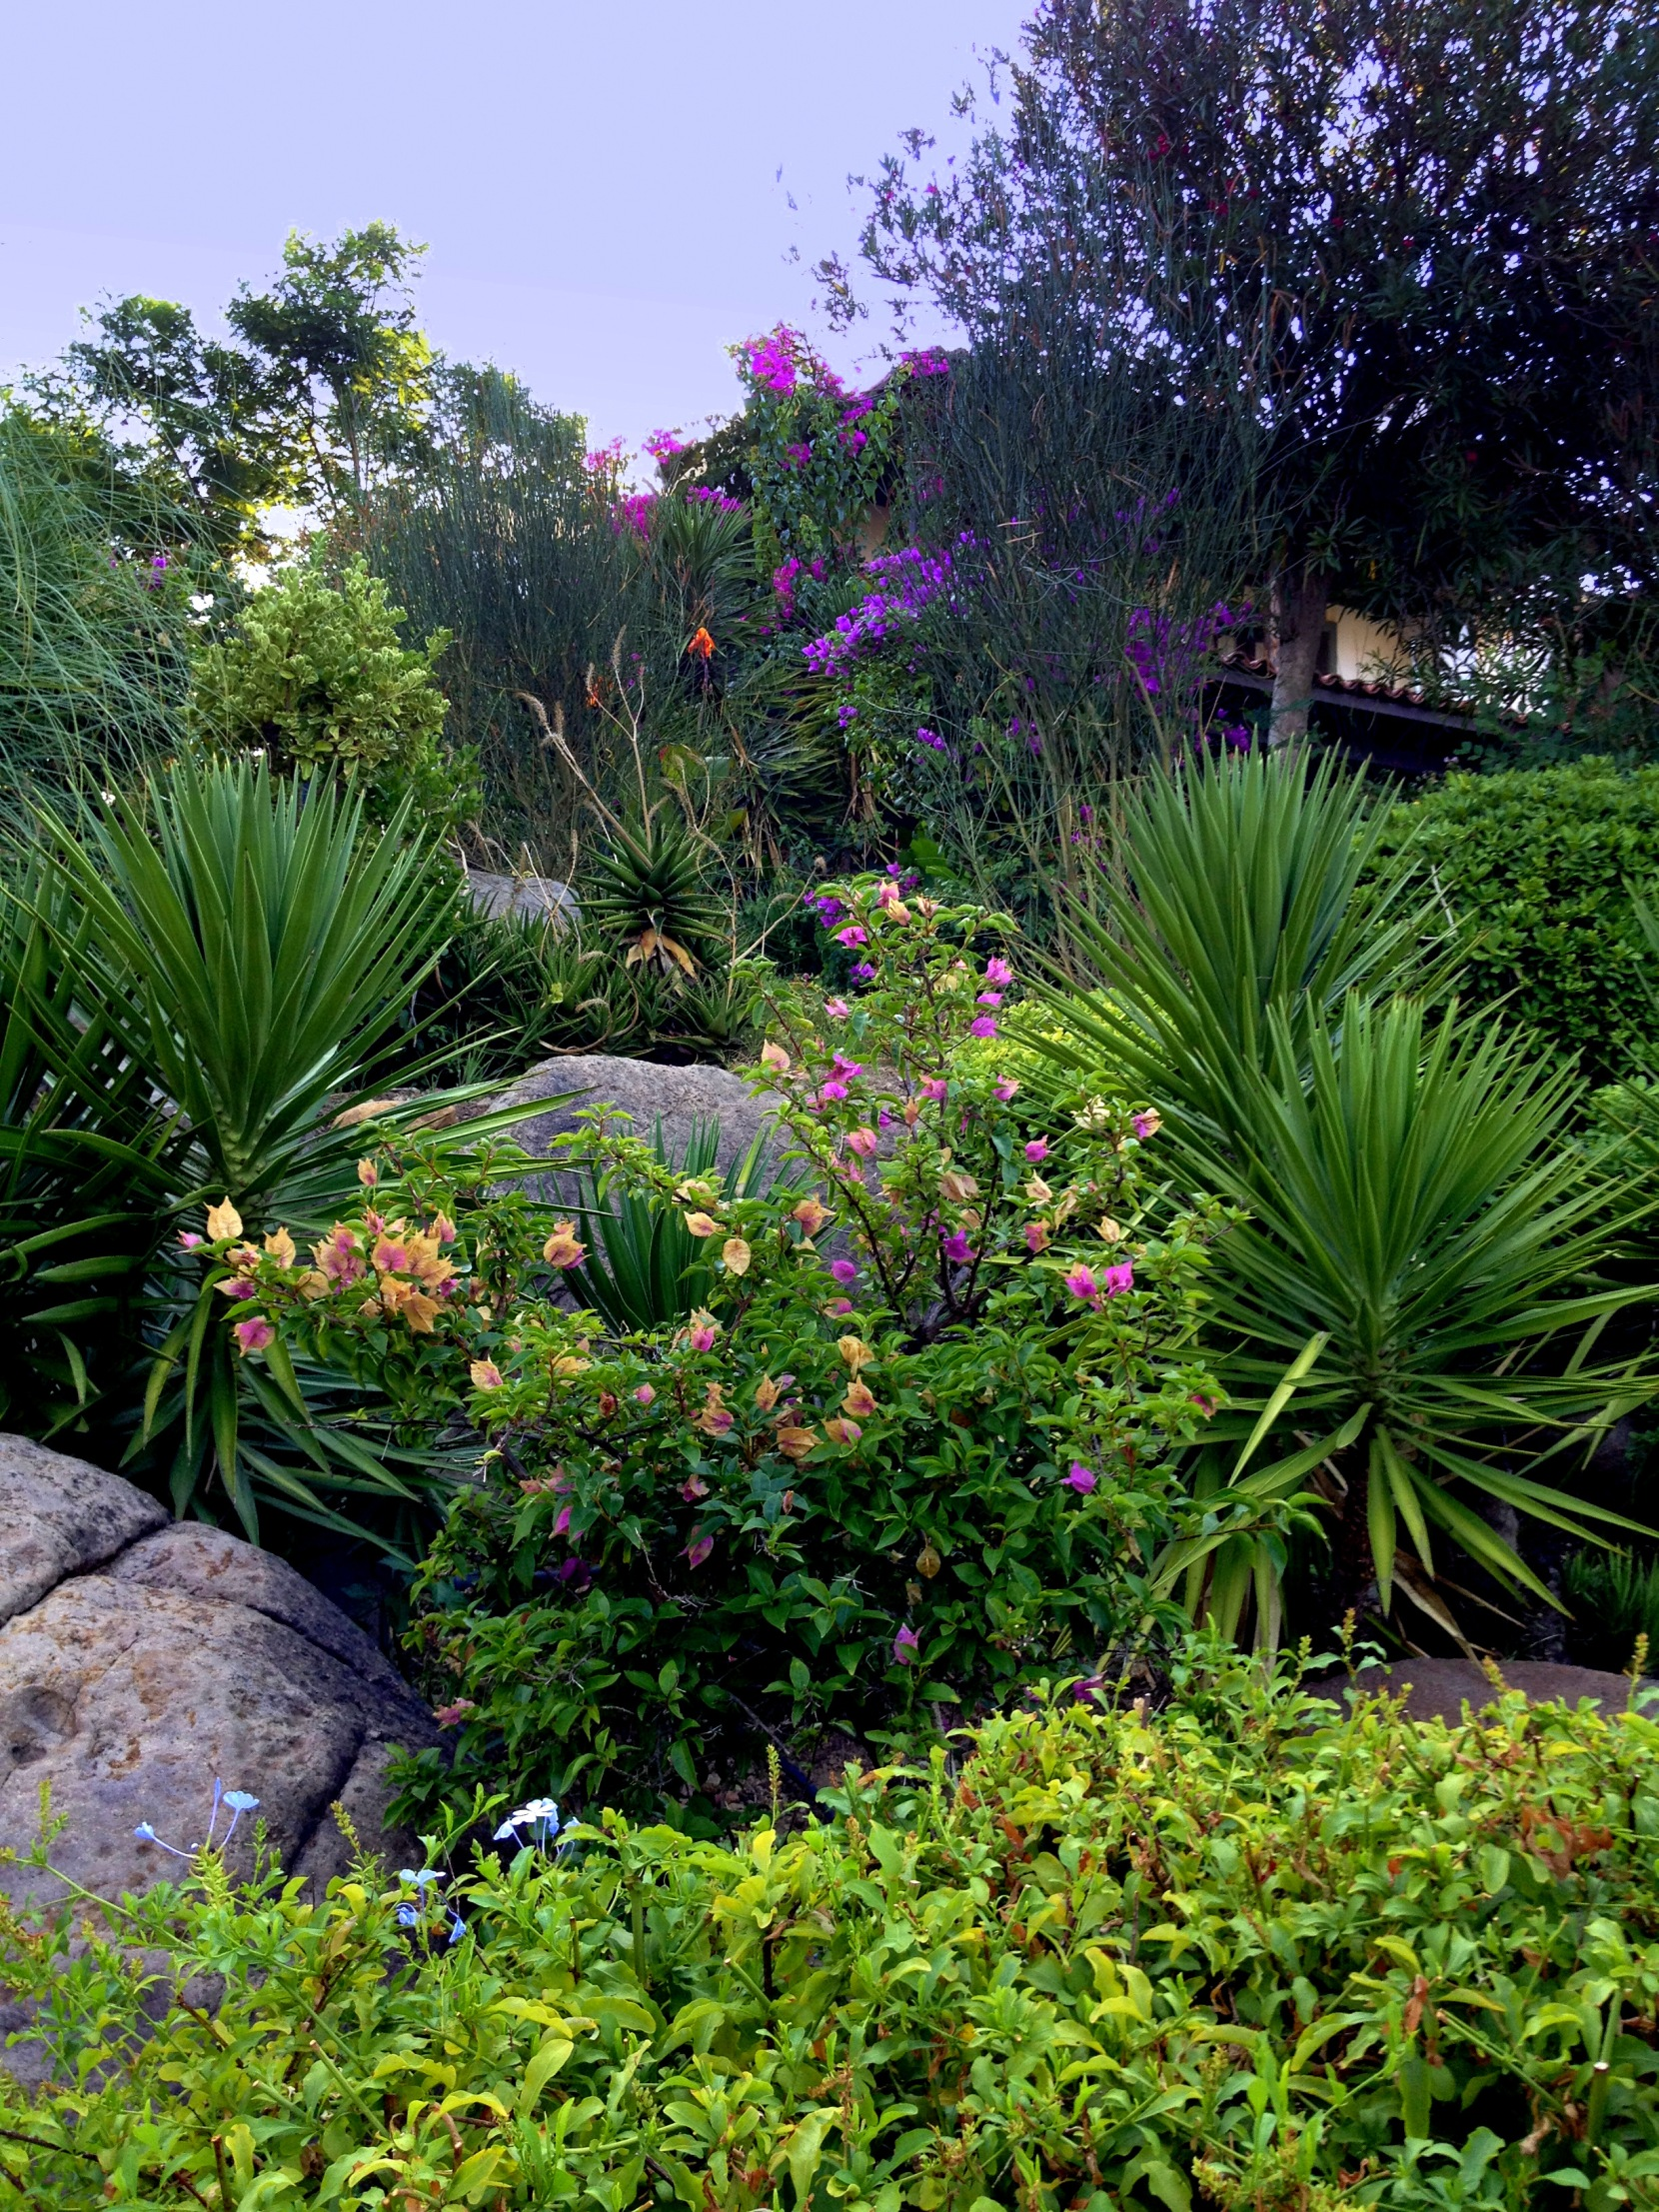 Summer Houses and Garden